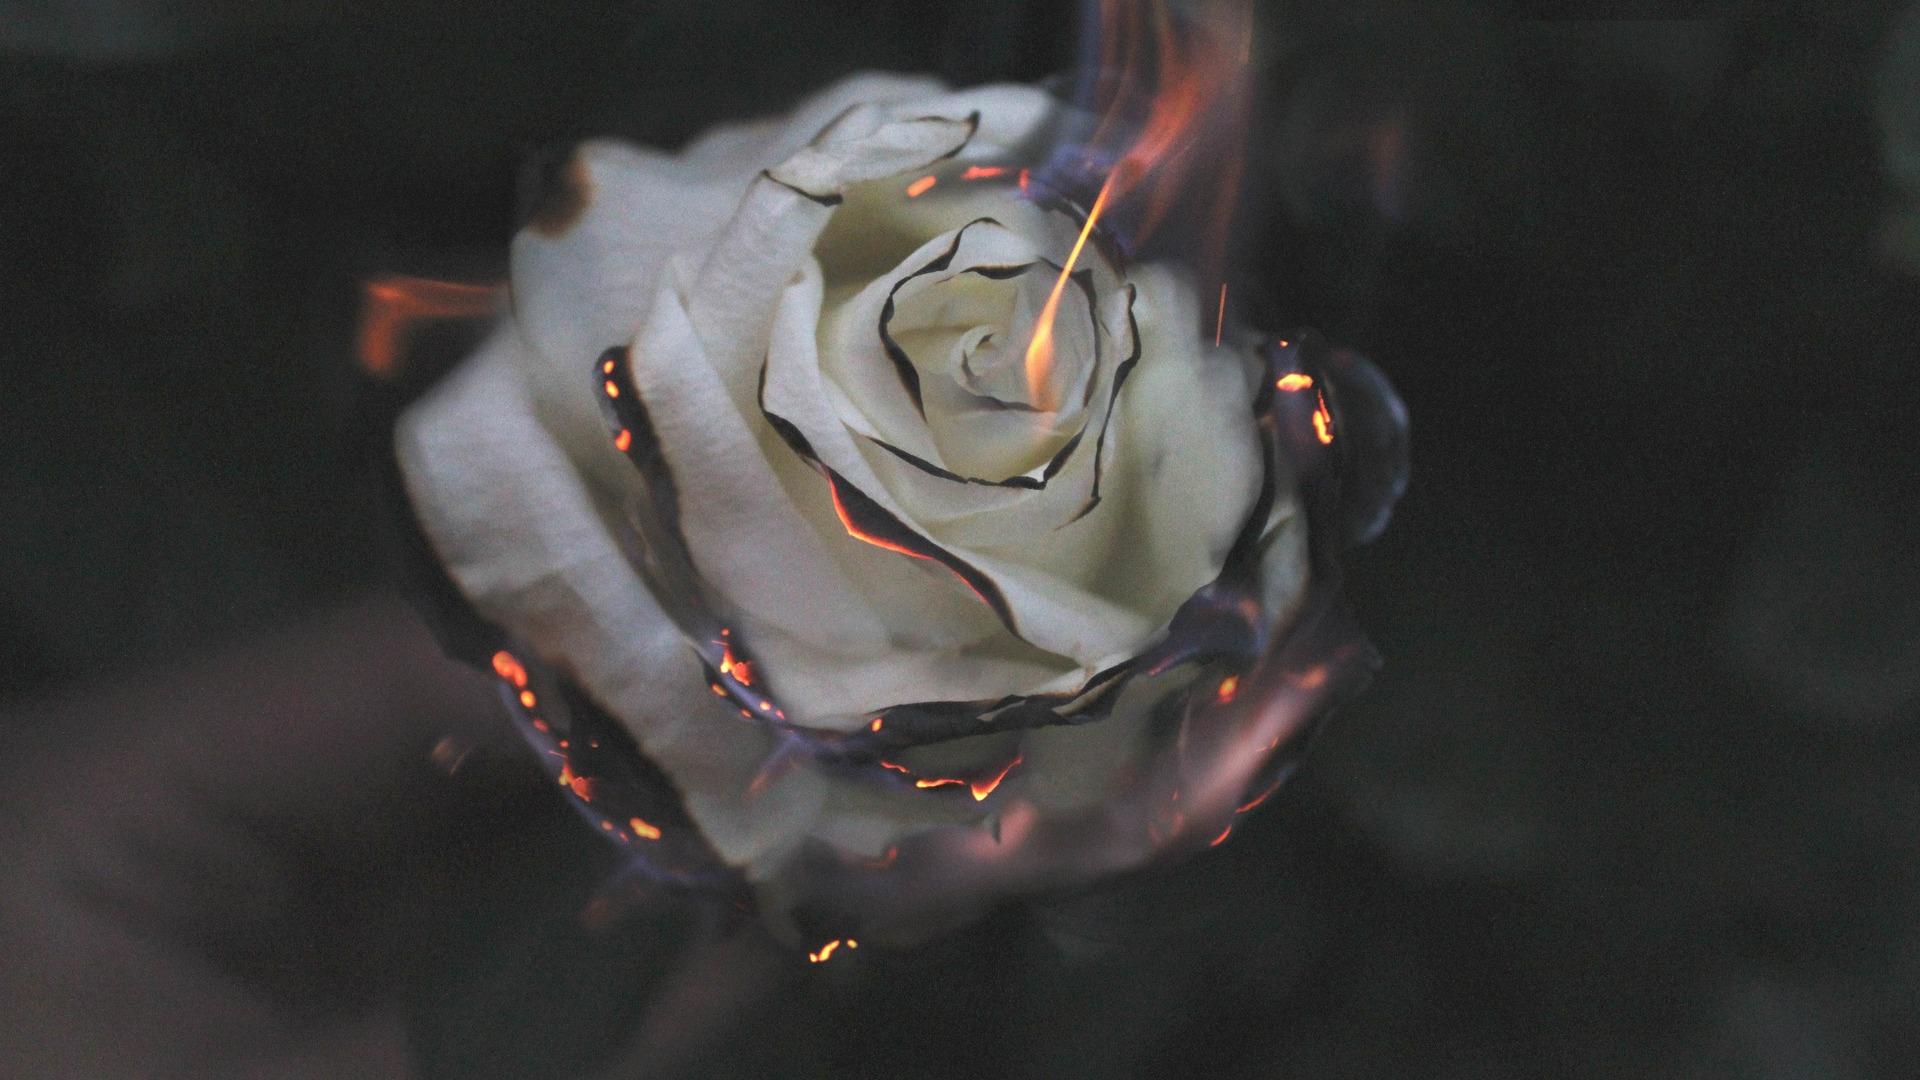 1920x1080 rose fire photography smoke laptop full hd 1080p hd 4k